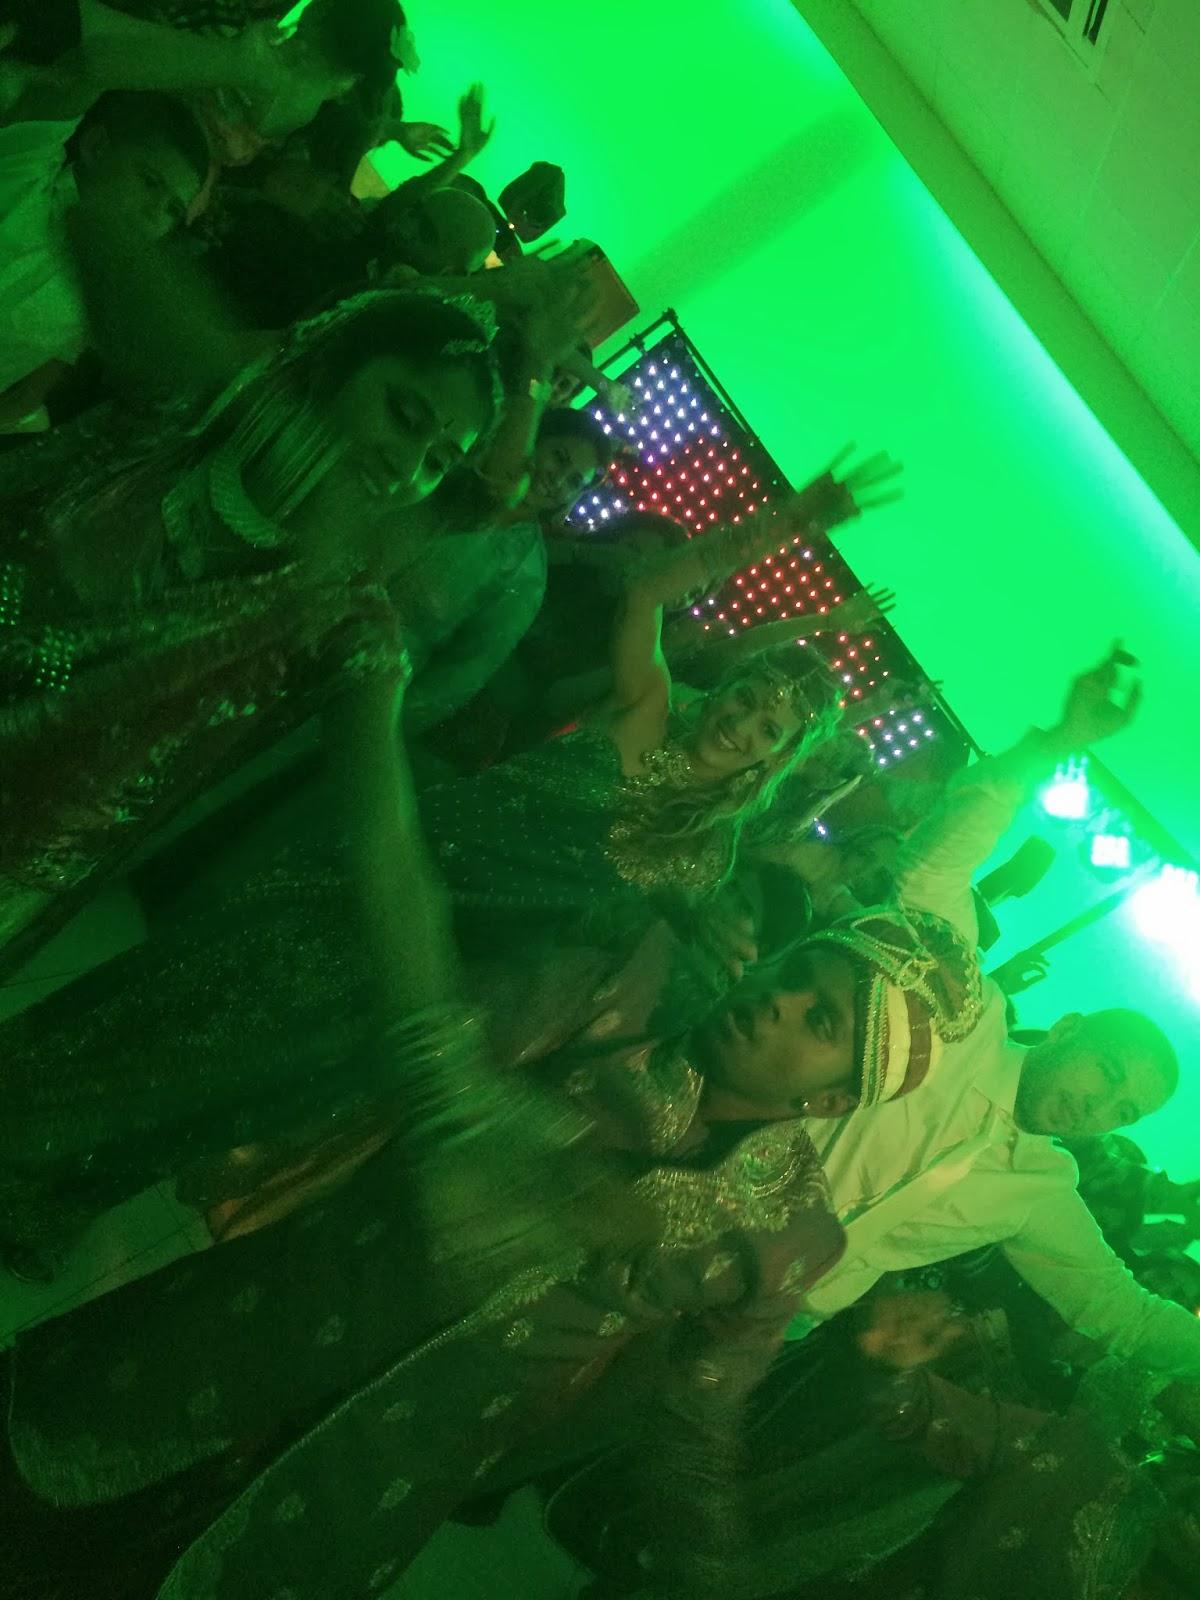 dj mariage marocain dj pour mariage marocain dj pour mariage algerien dj mariage oriental dj pour - Dj Oriental Pour Mariage